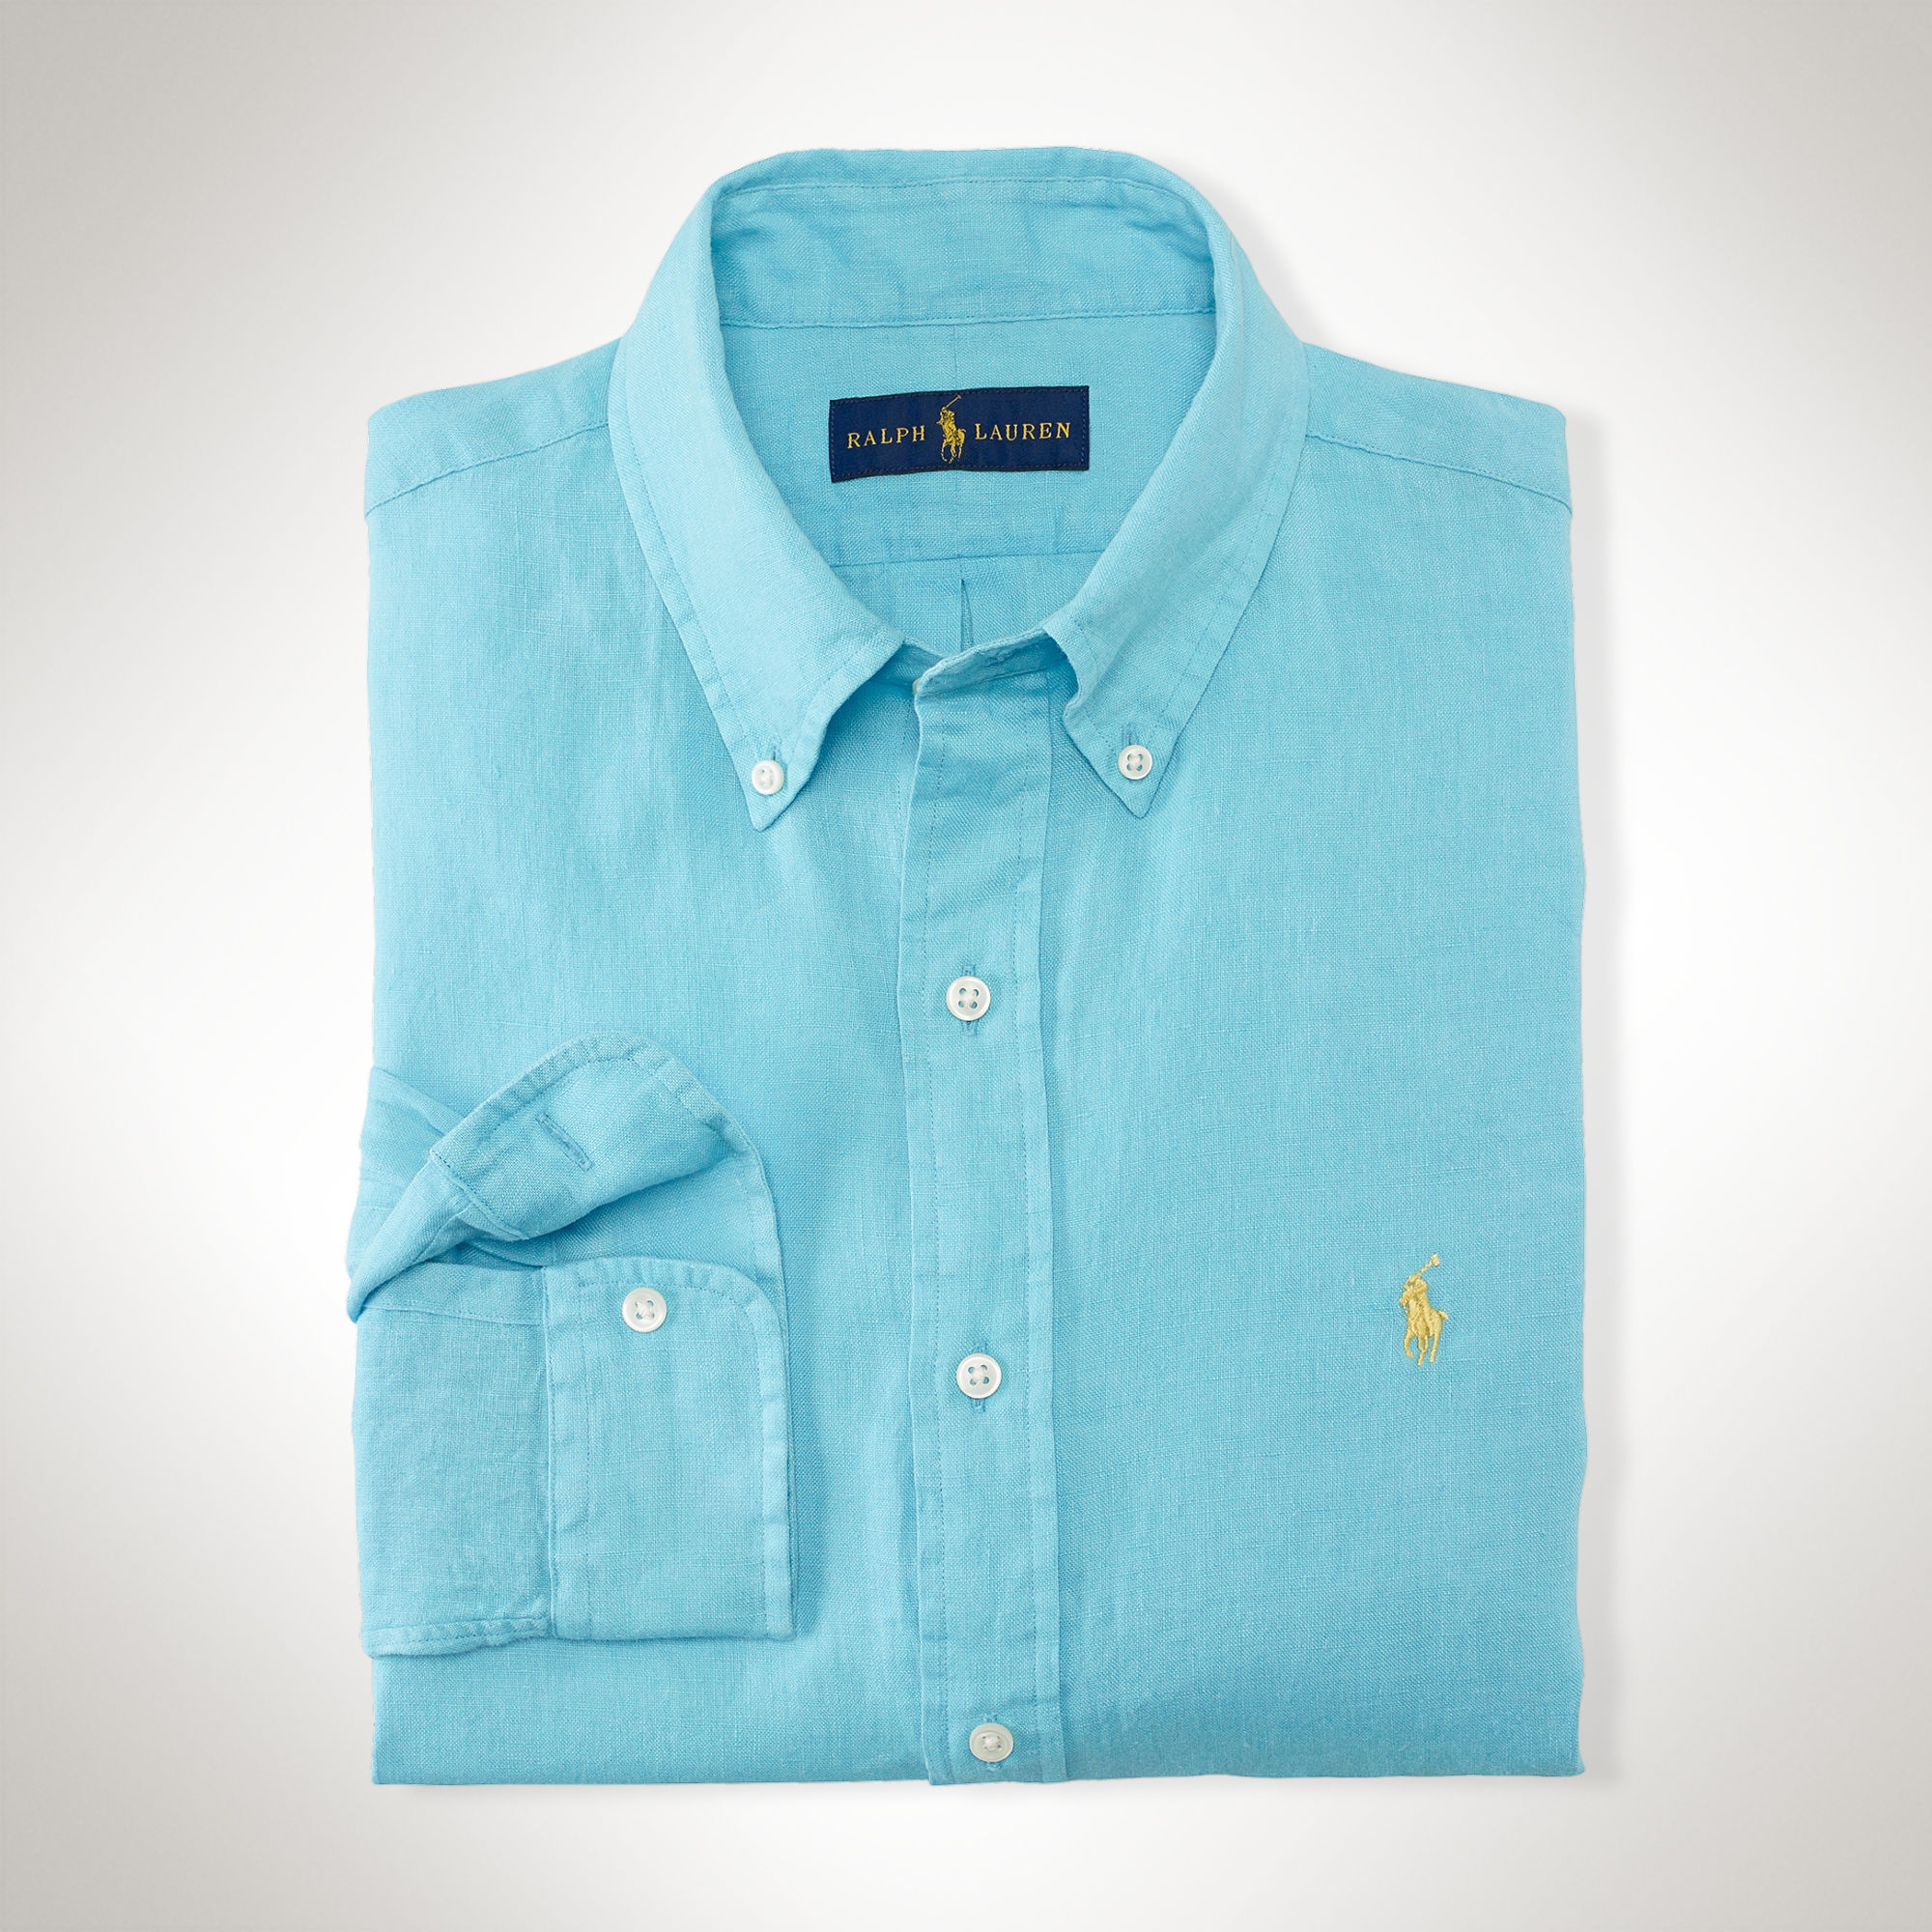 Ralph Lauren Gömlek Aqua - 2 #   Maslak Outlet #RalphLauren #Gömlek